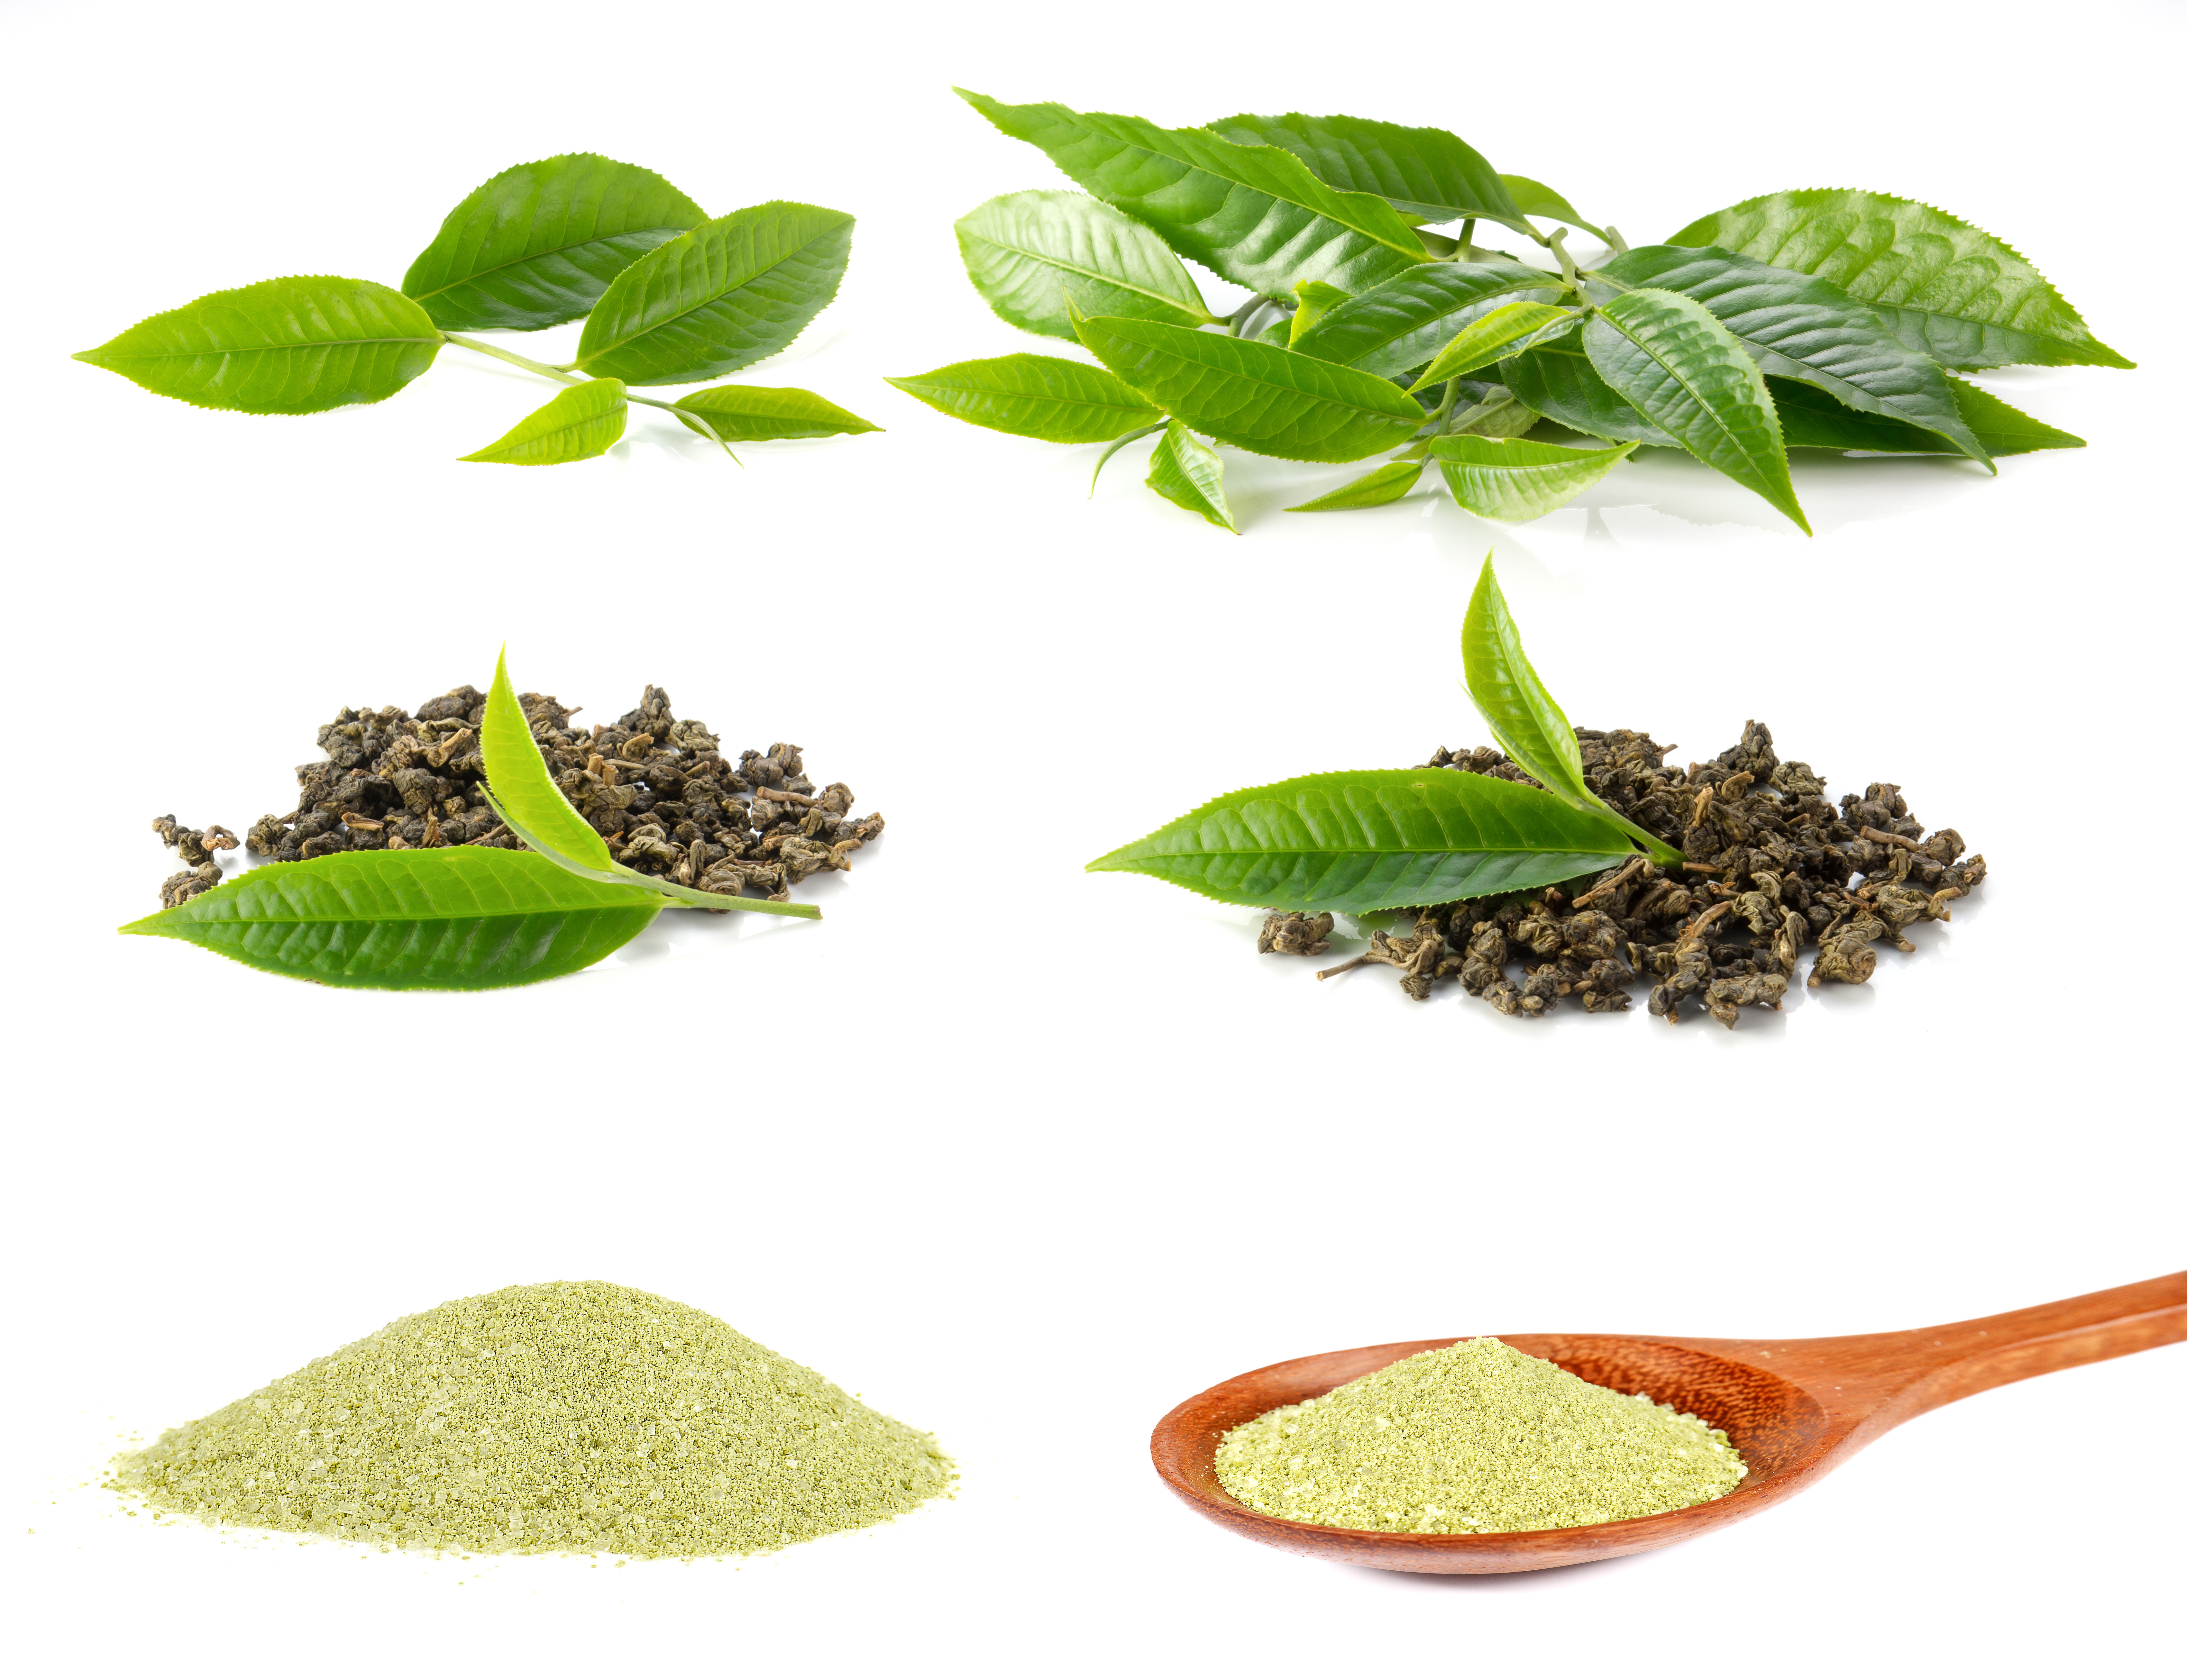 Studien über Matcha Tee